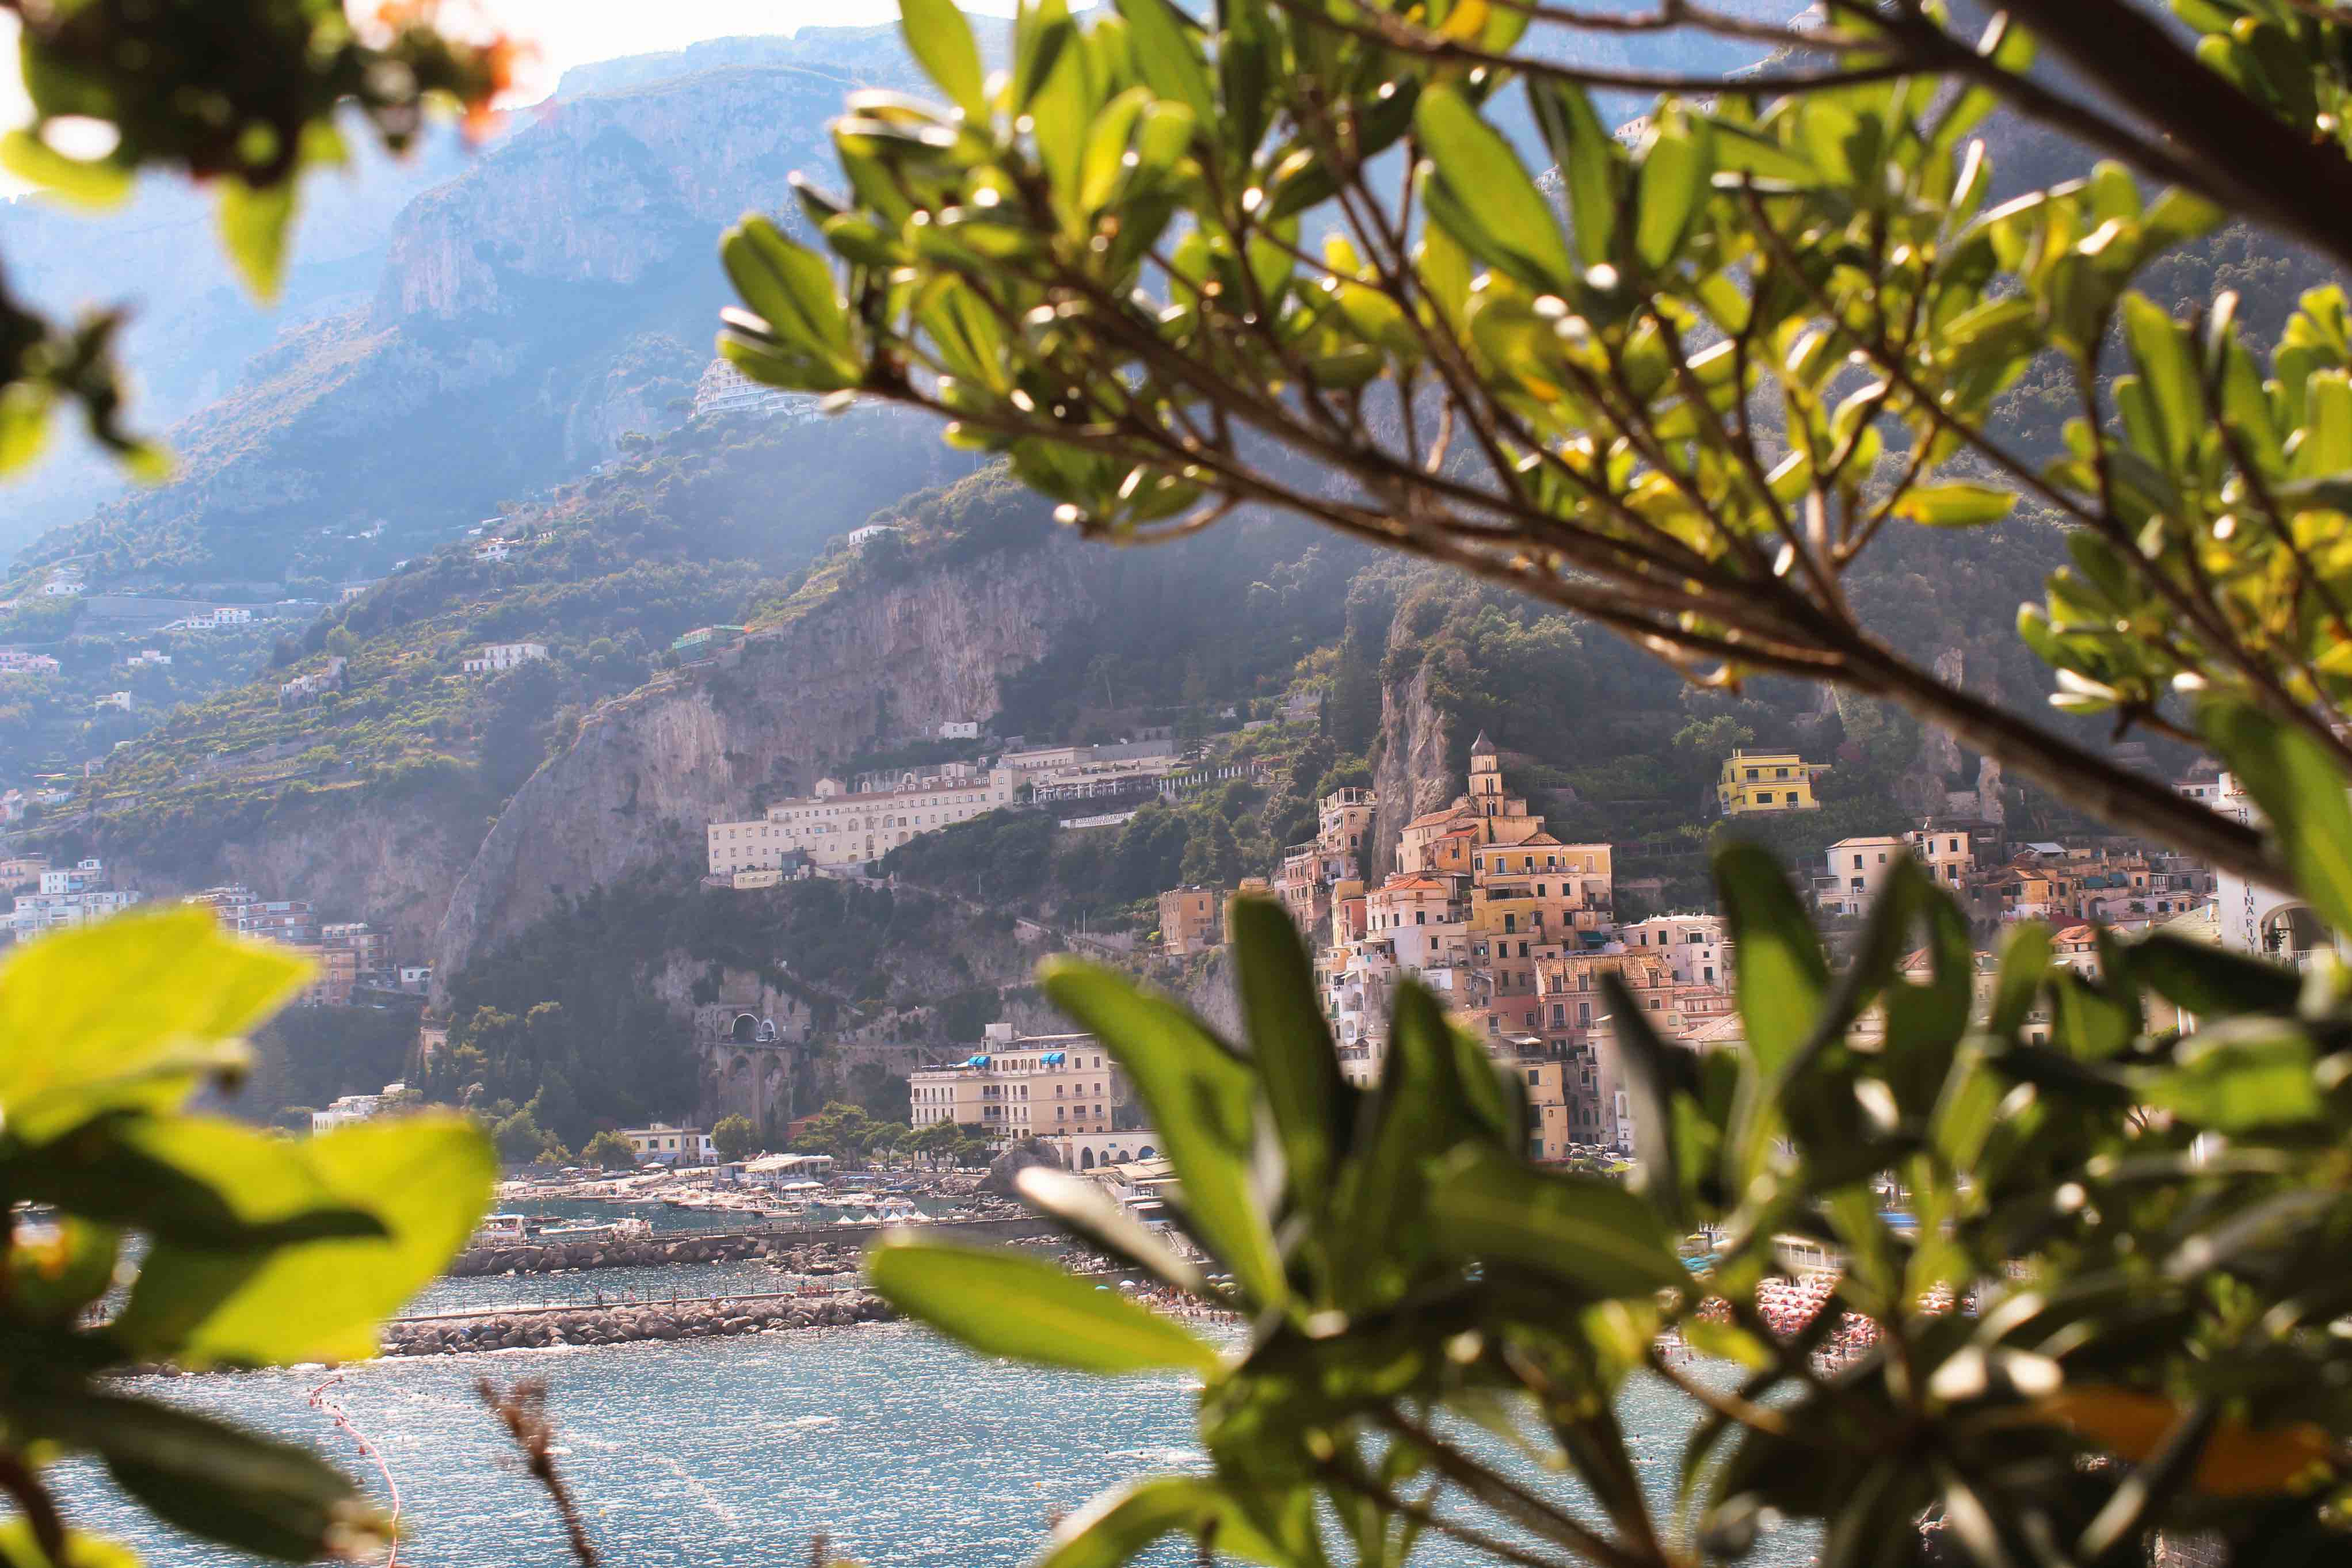 z-neapolu-na-amalfske-pobrezie